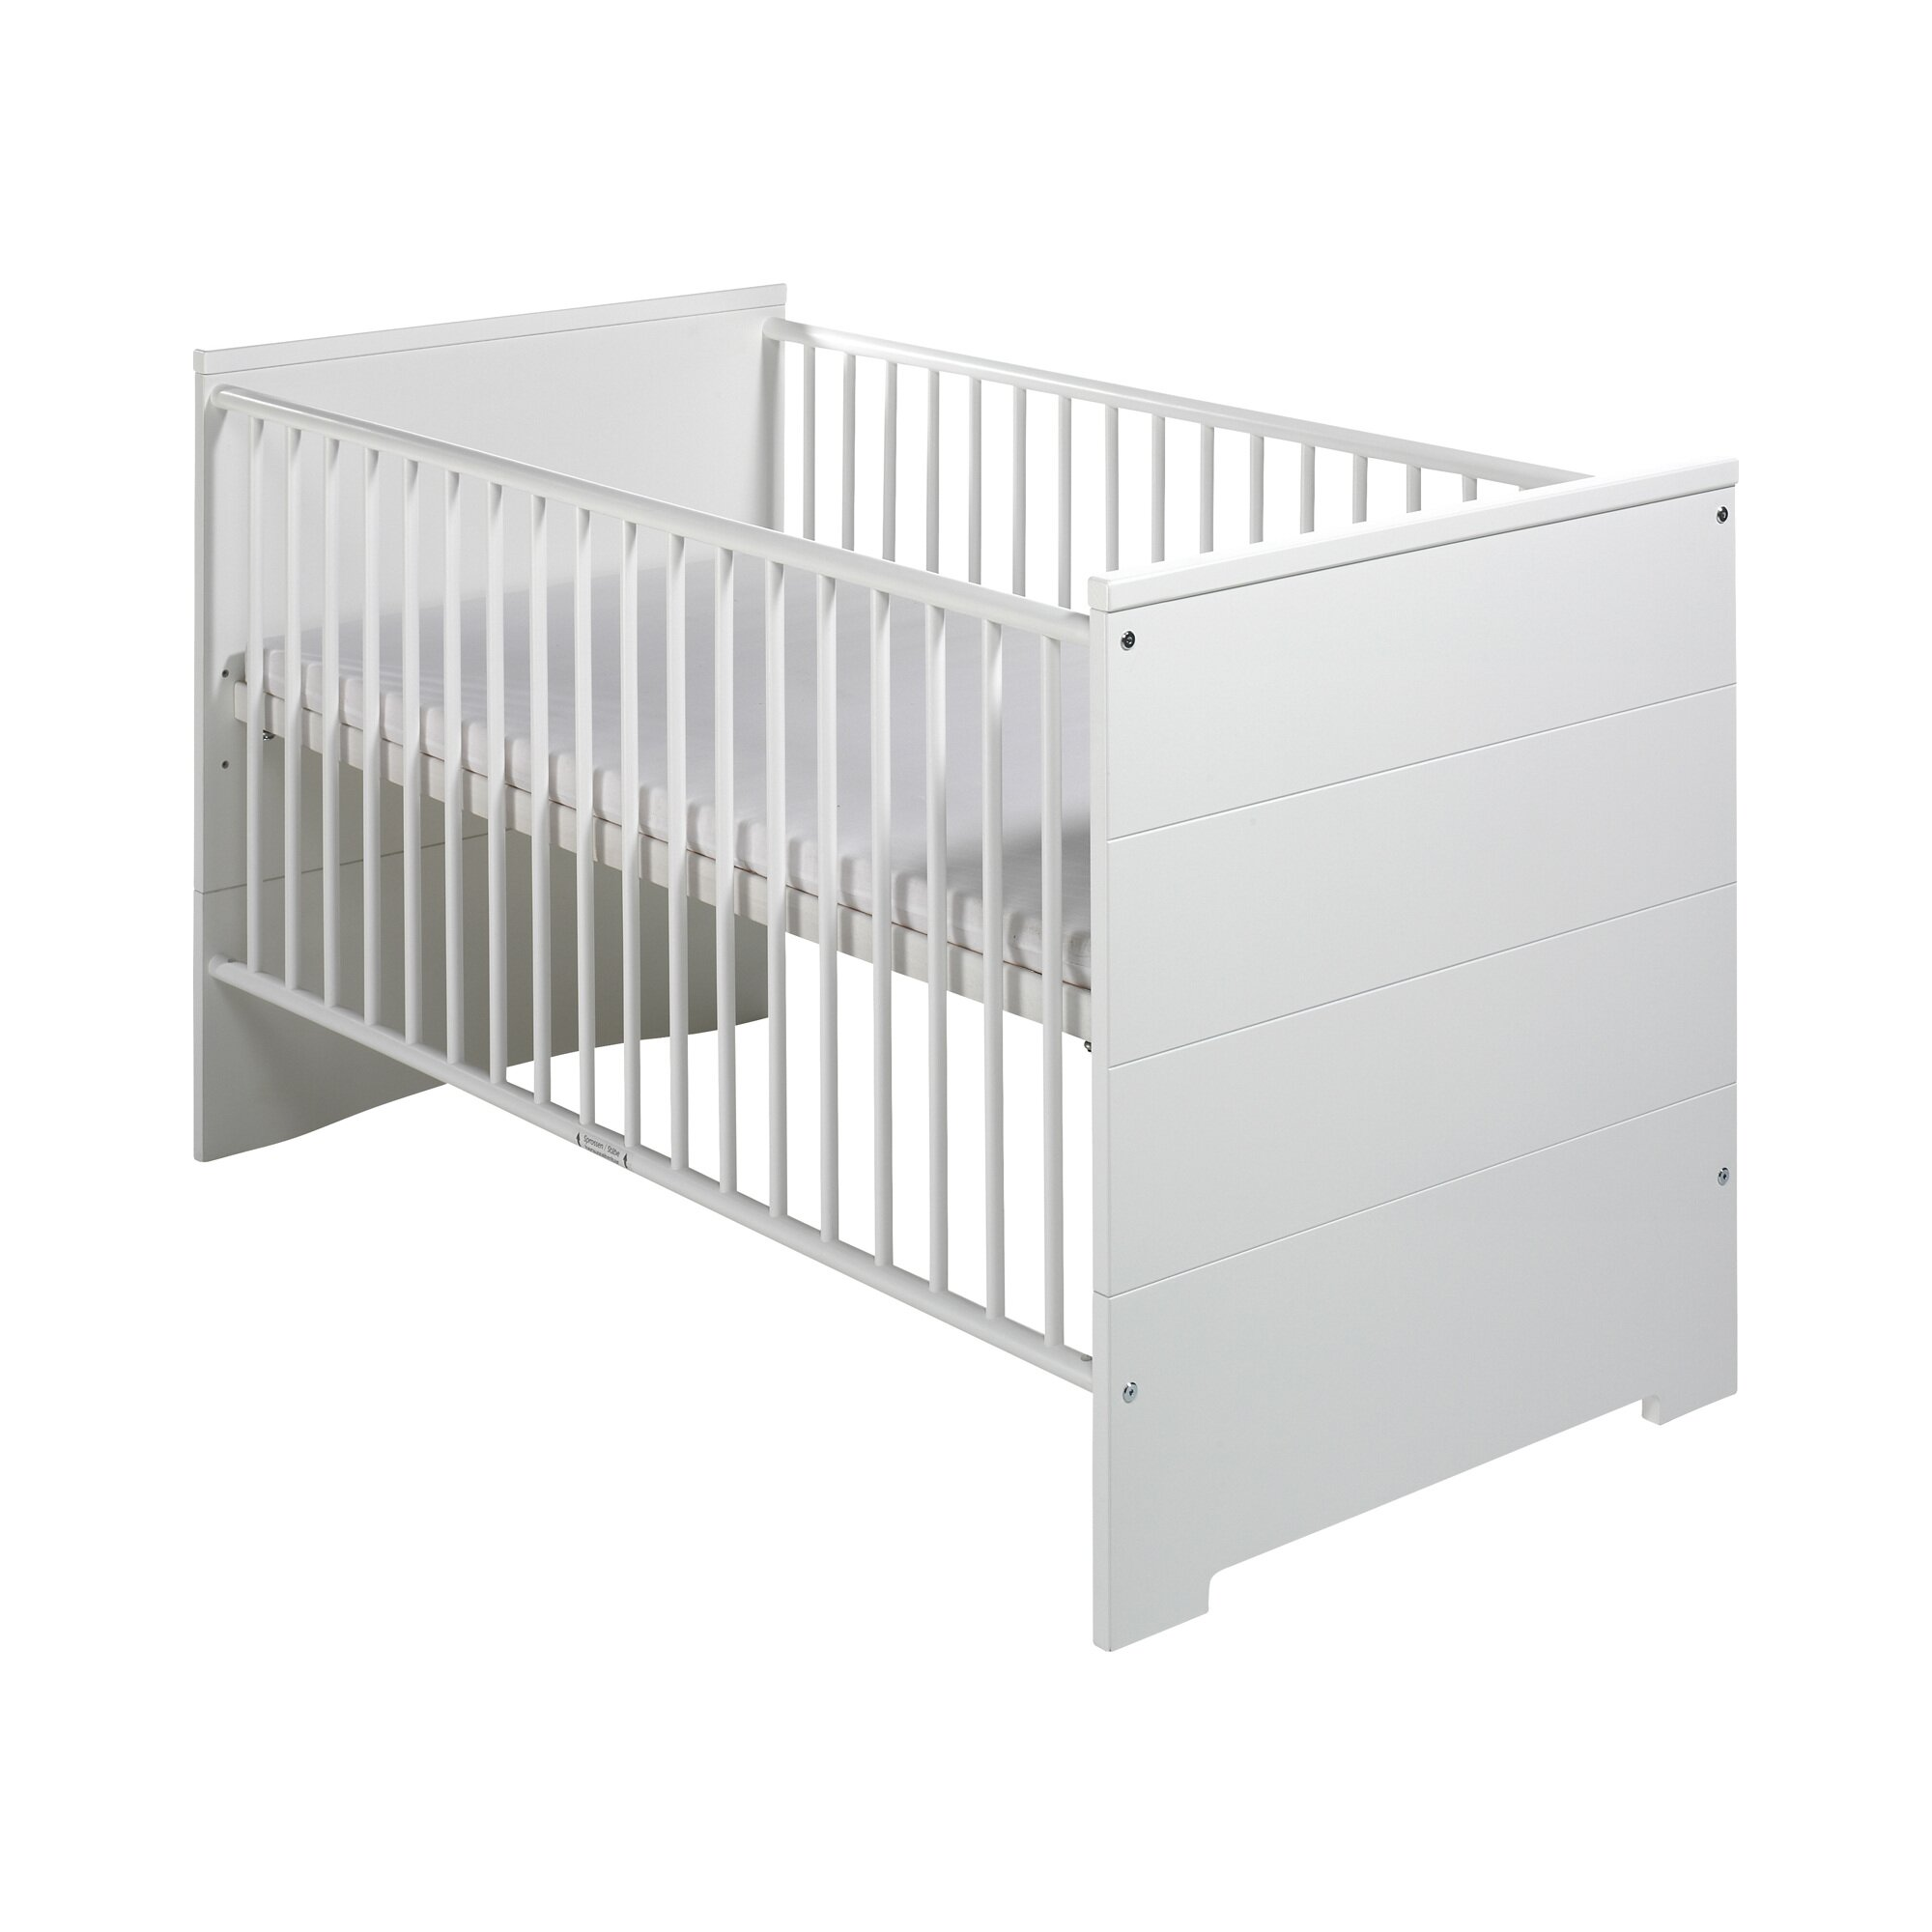 Schardt Babybett Eco Stripe 70x140 cm